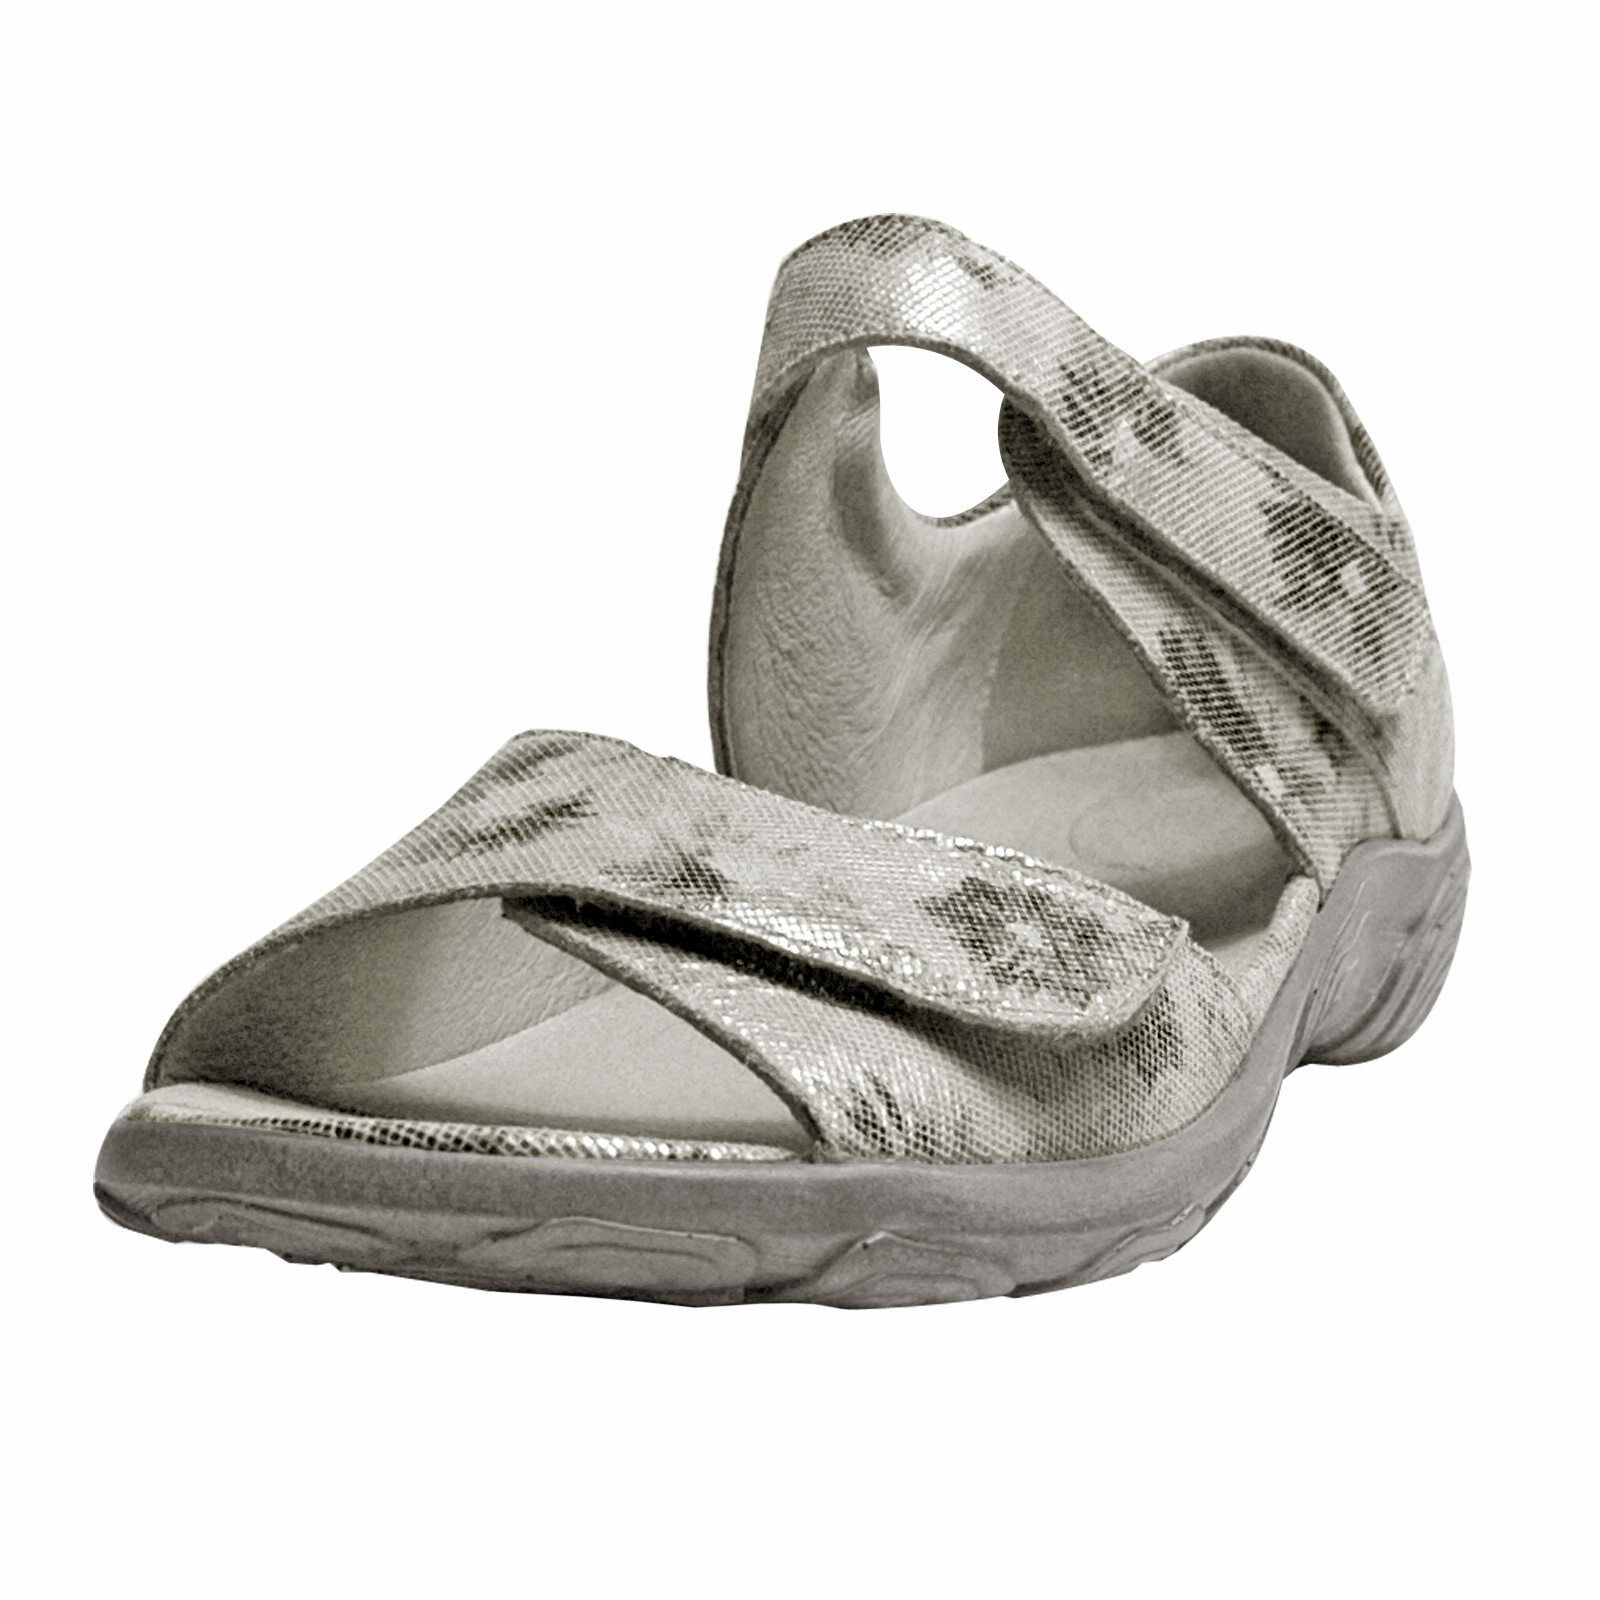 Rôdeur femmes sandales Haruna 334802168070 Monet pierre, Largeur H